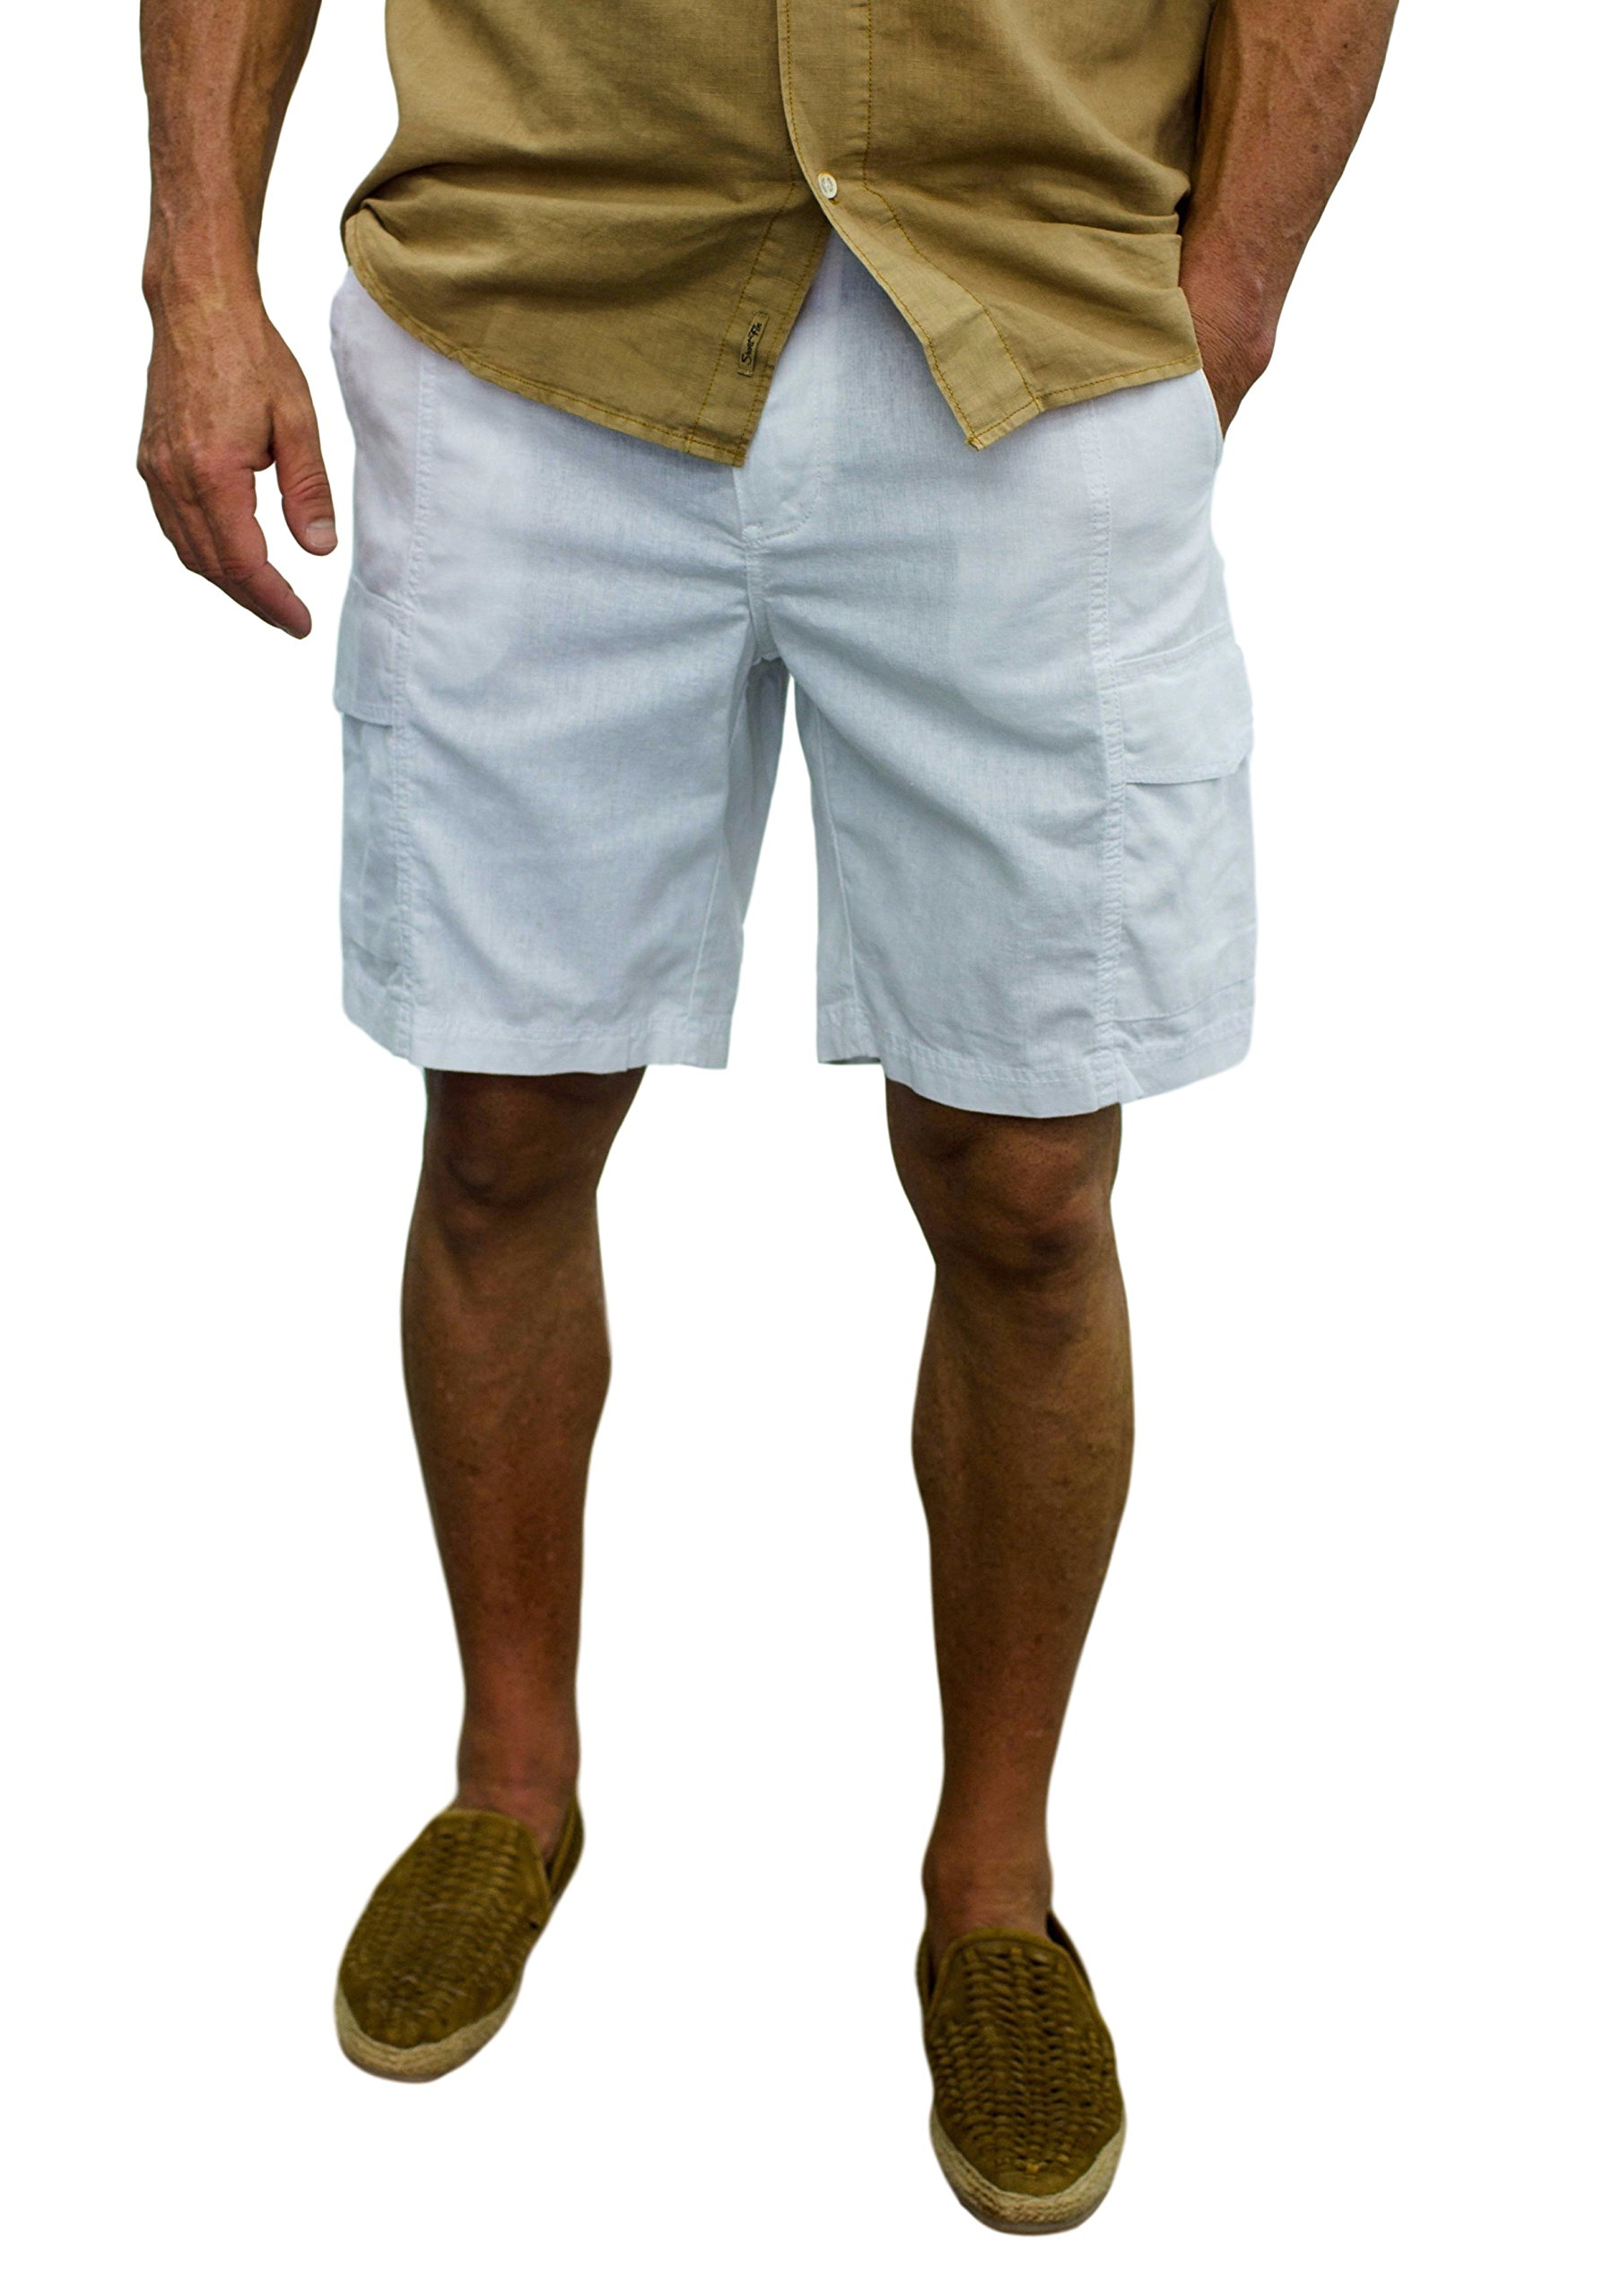 L8006 Shorts Size 36 White